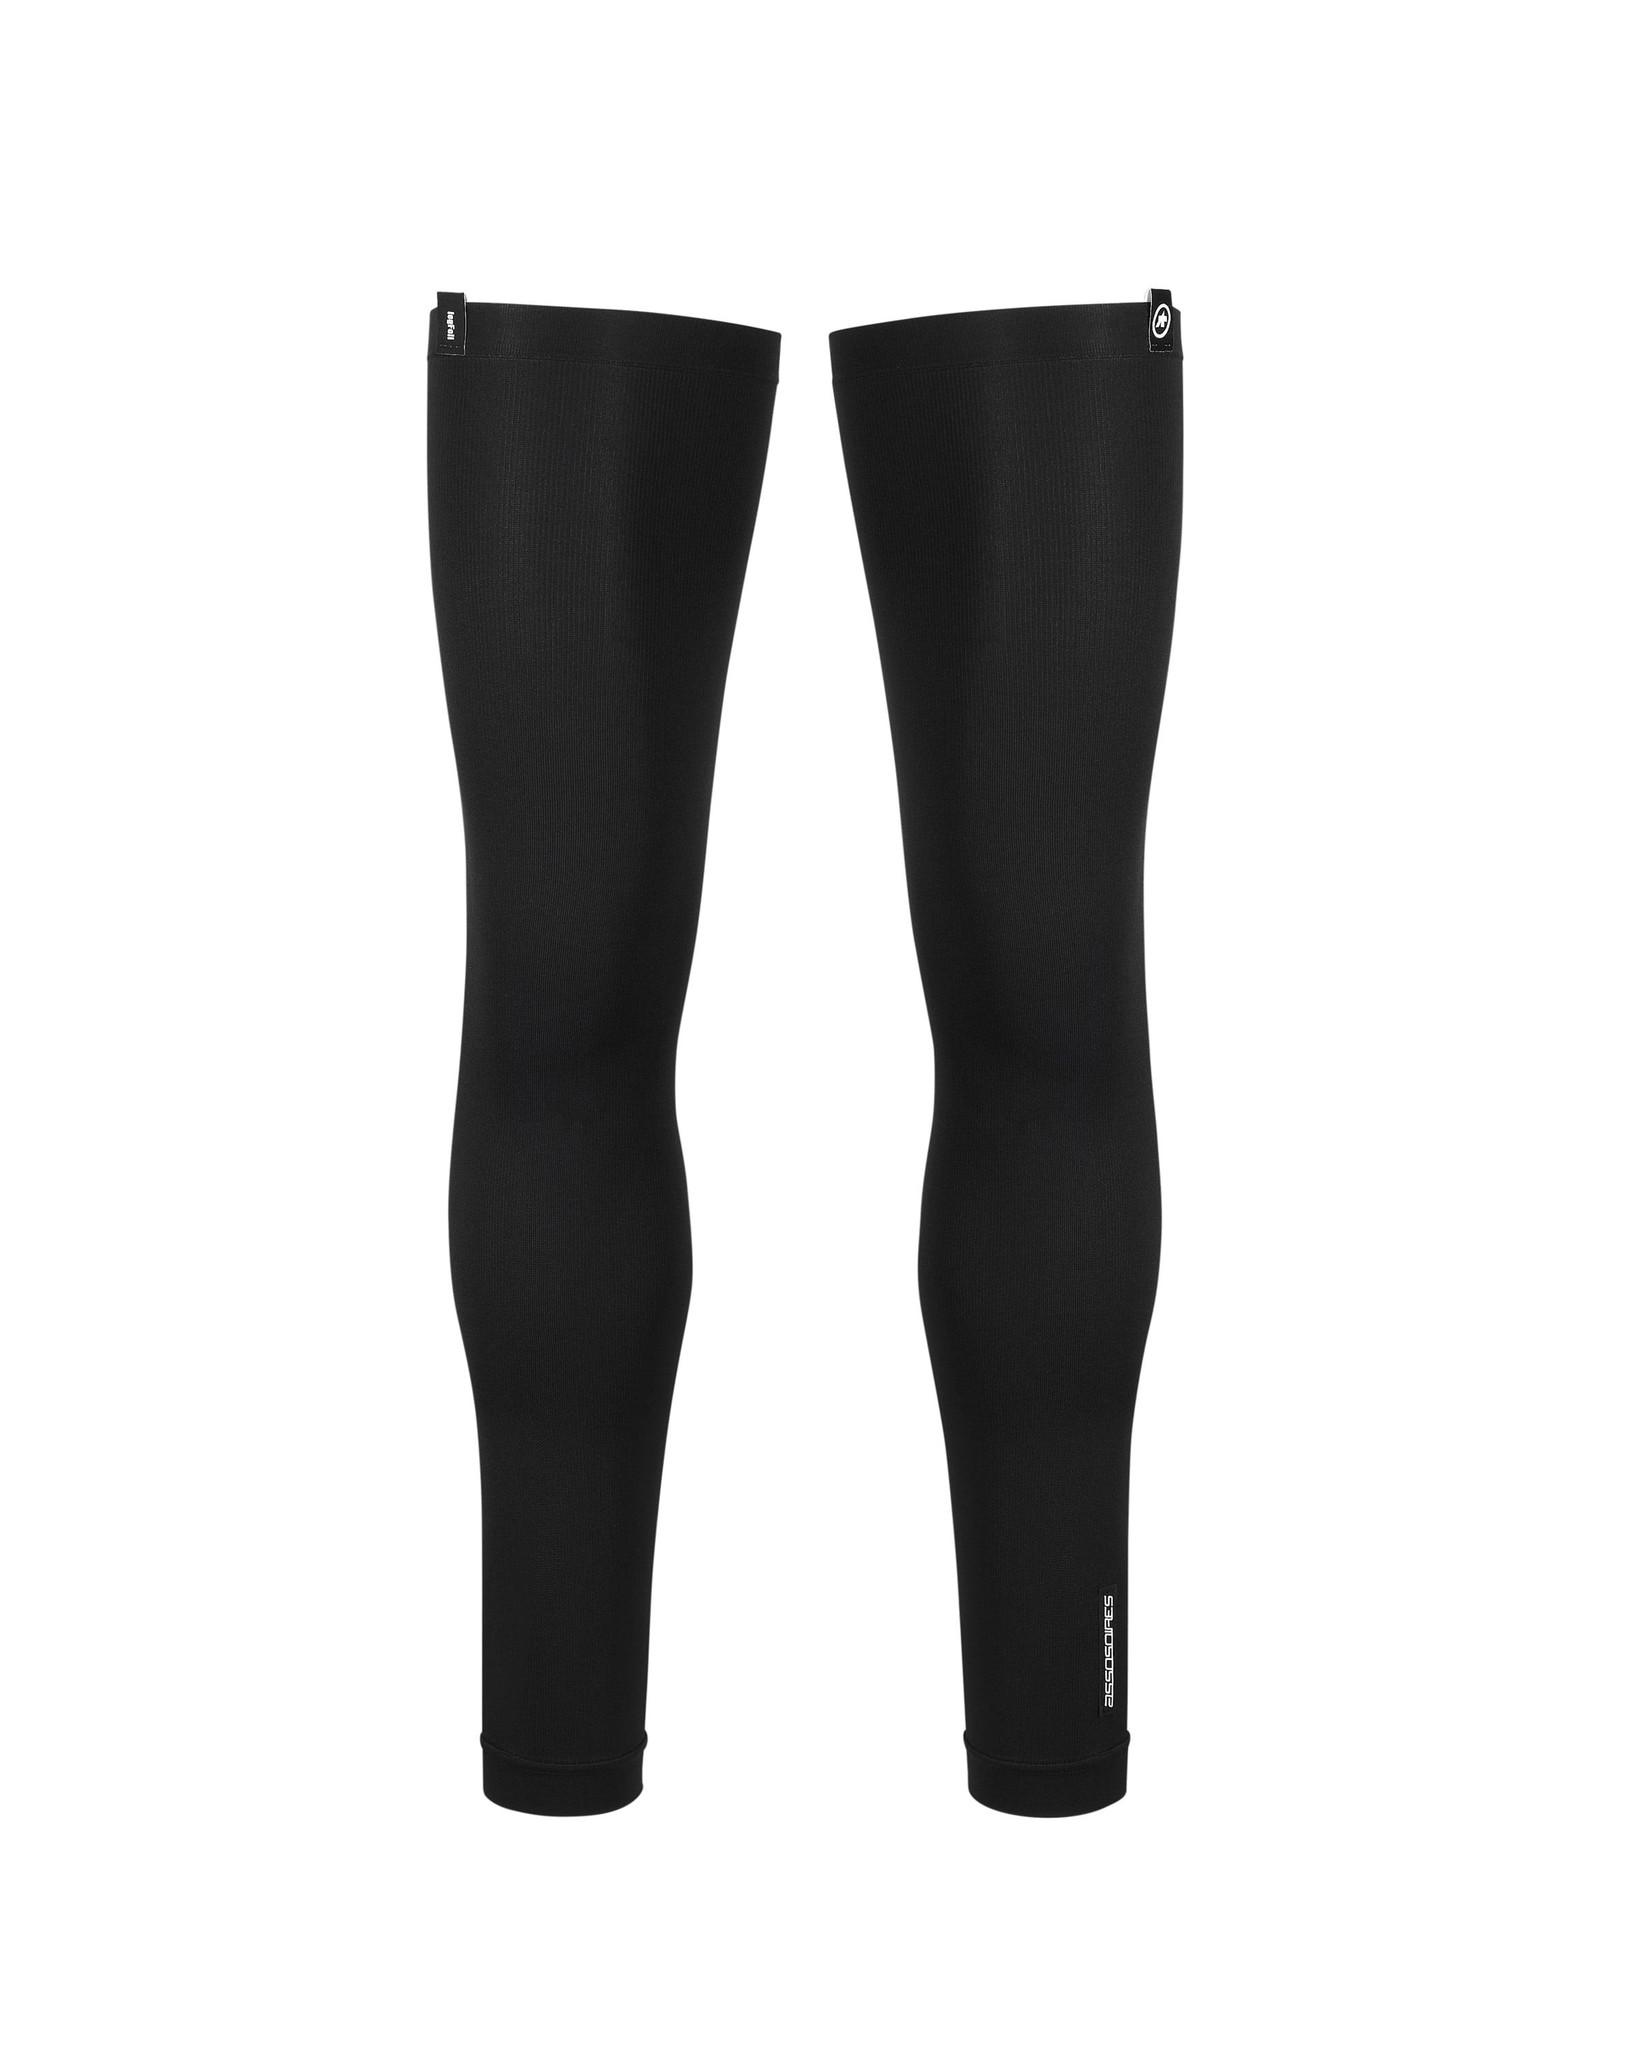 Assos ASSOSOIRES Leg Foil Zwart Beenstukken Beenwarmers